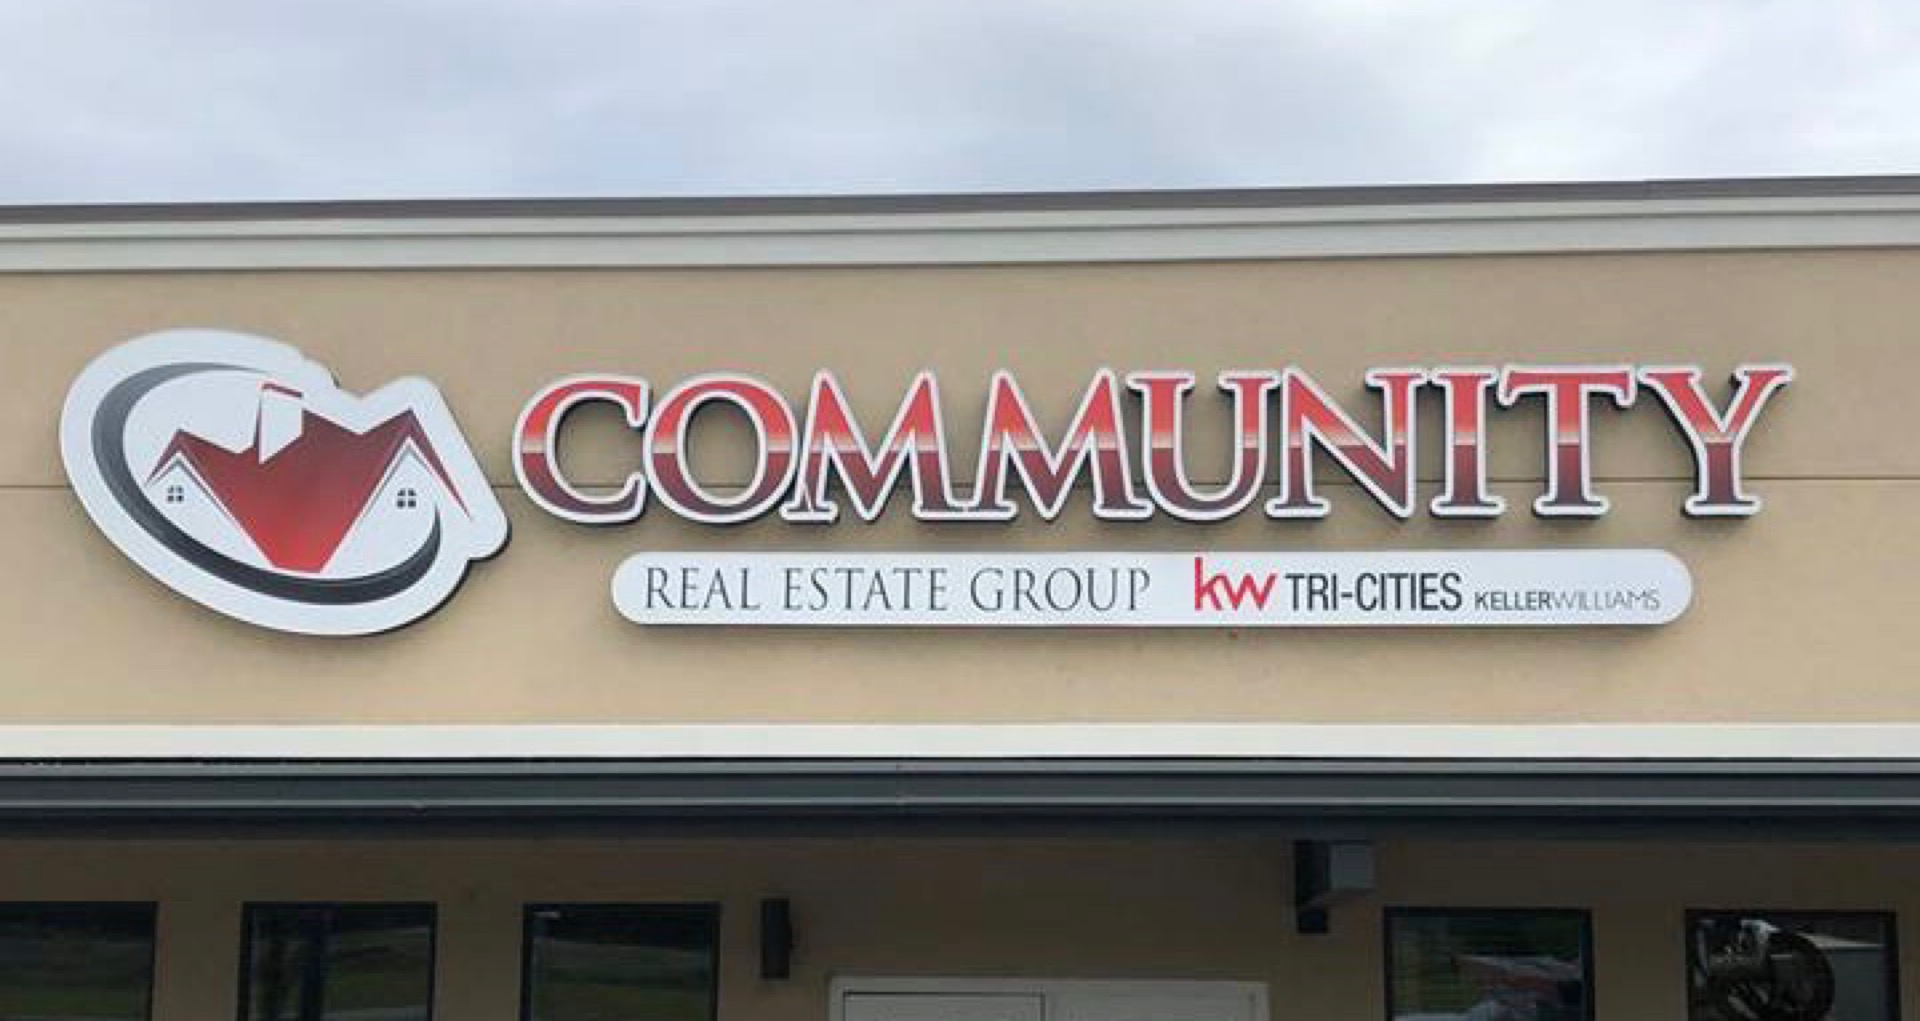 Community Real Estate Group Keller Williams Tri-Cities | 4390 W Van Giesen St, West Richland, WA, 99353 | +1 (509) 420-4990